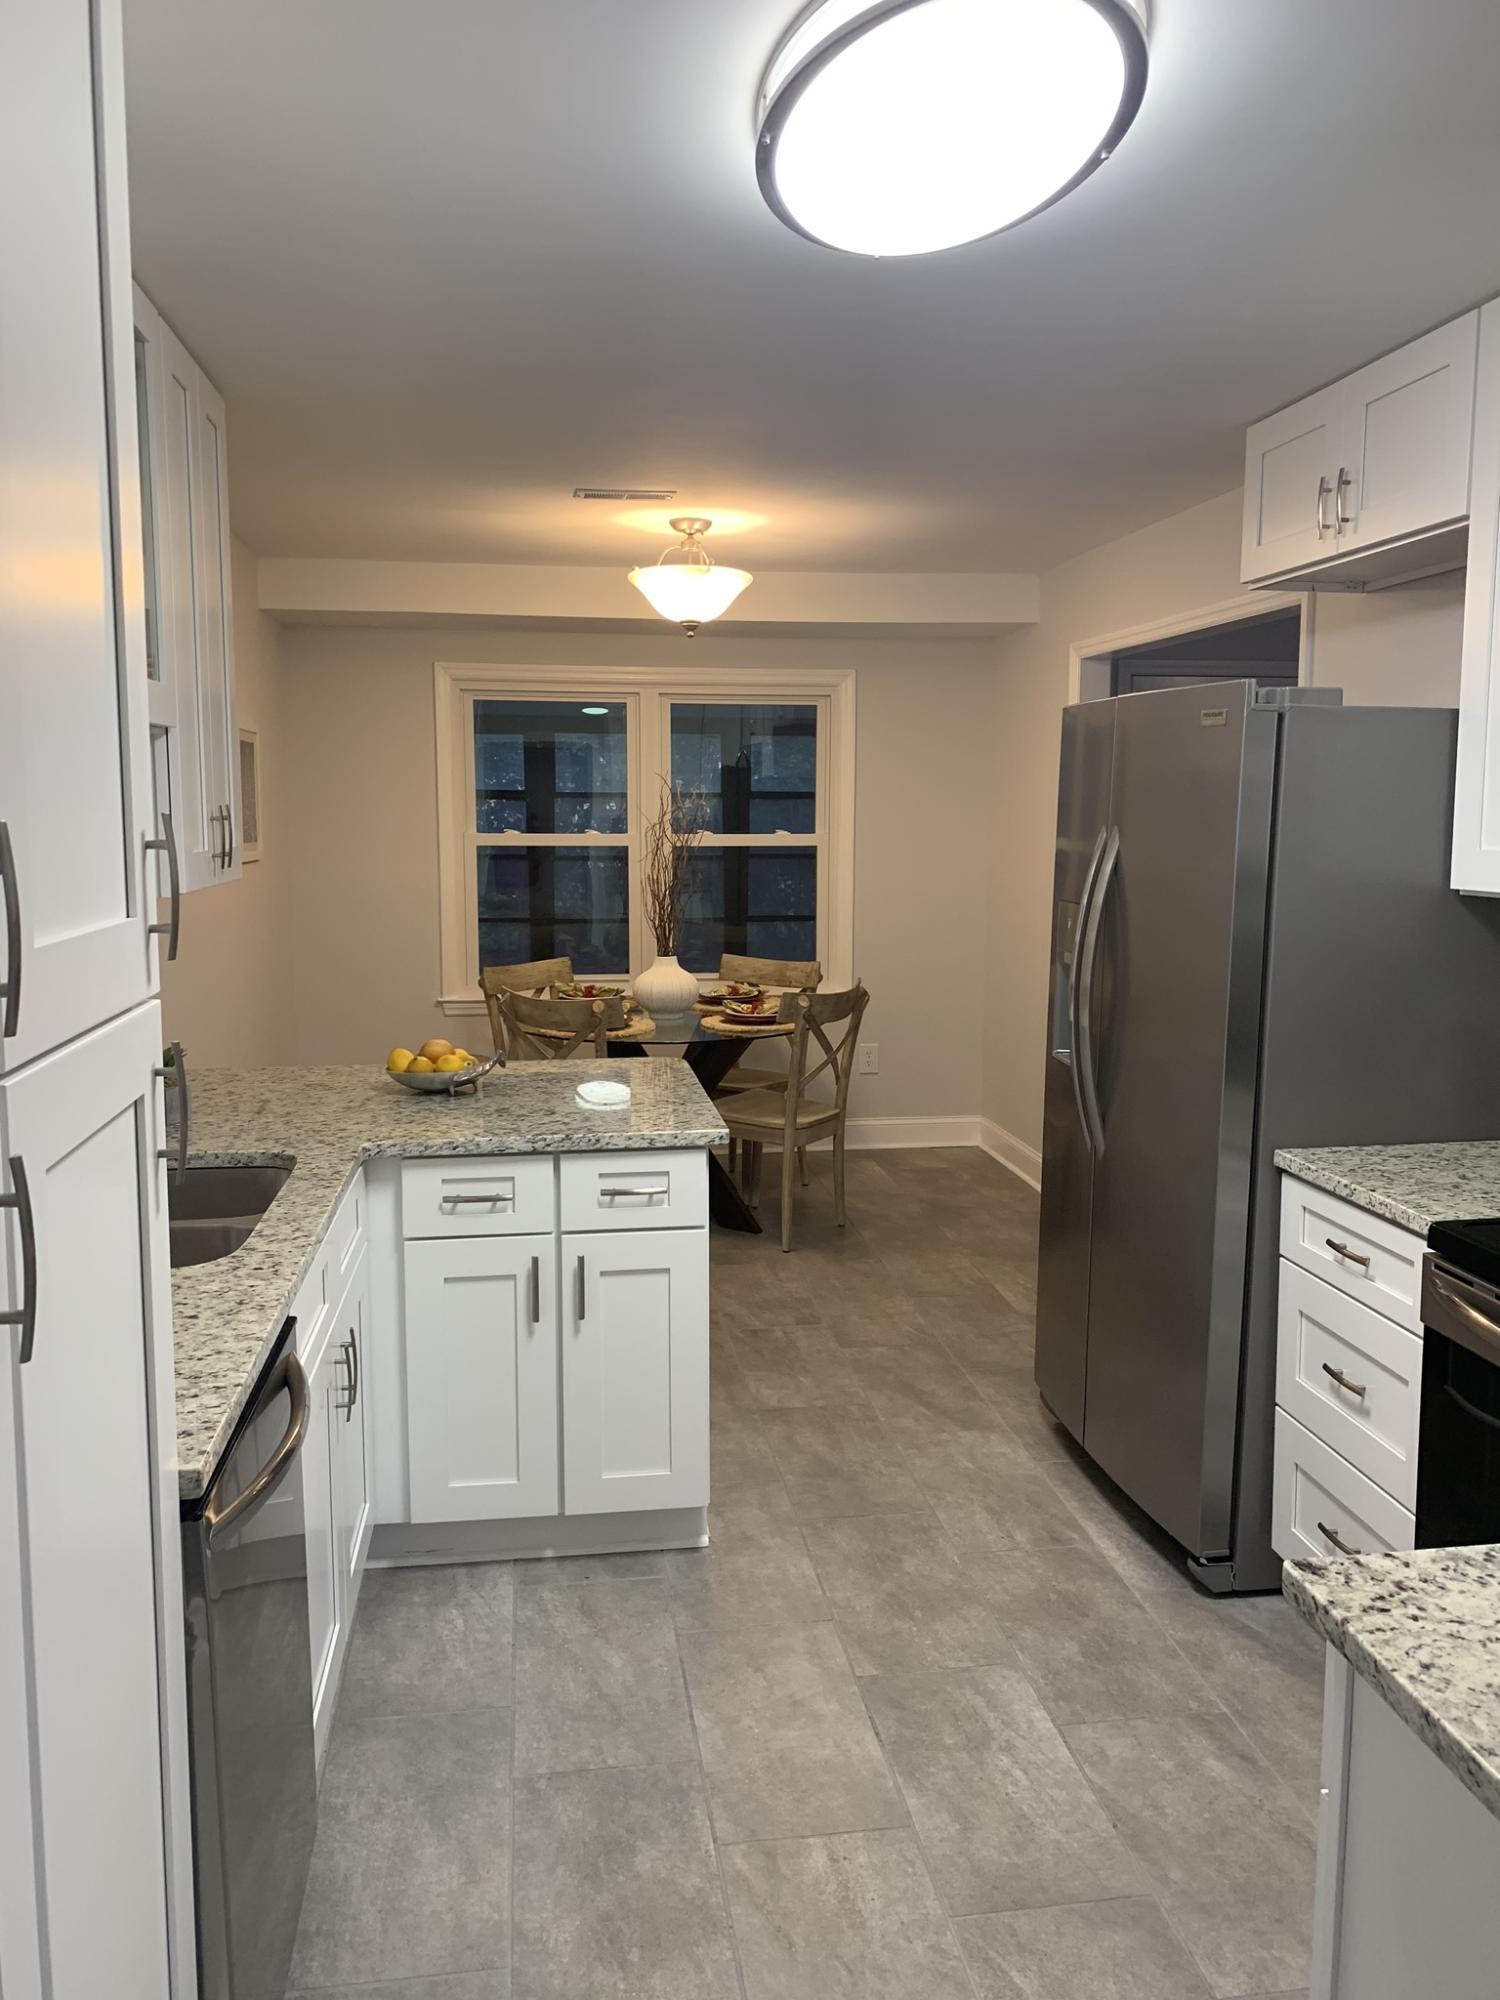 Heathwood Ext Homes For Sale - 2 Blaine, Charleston, SC - 2